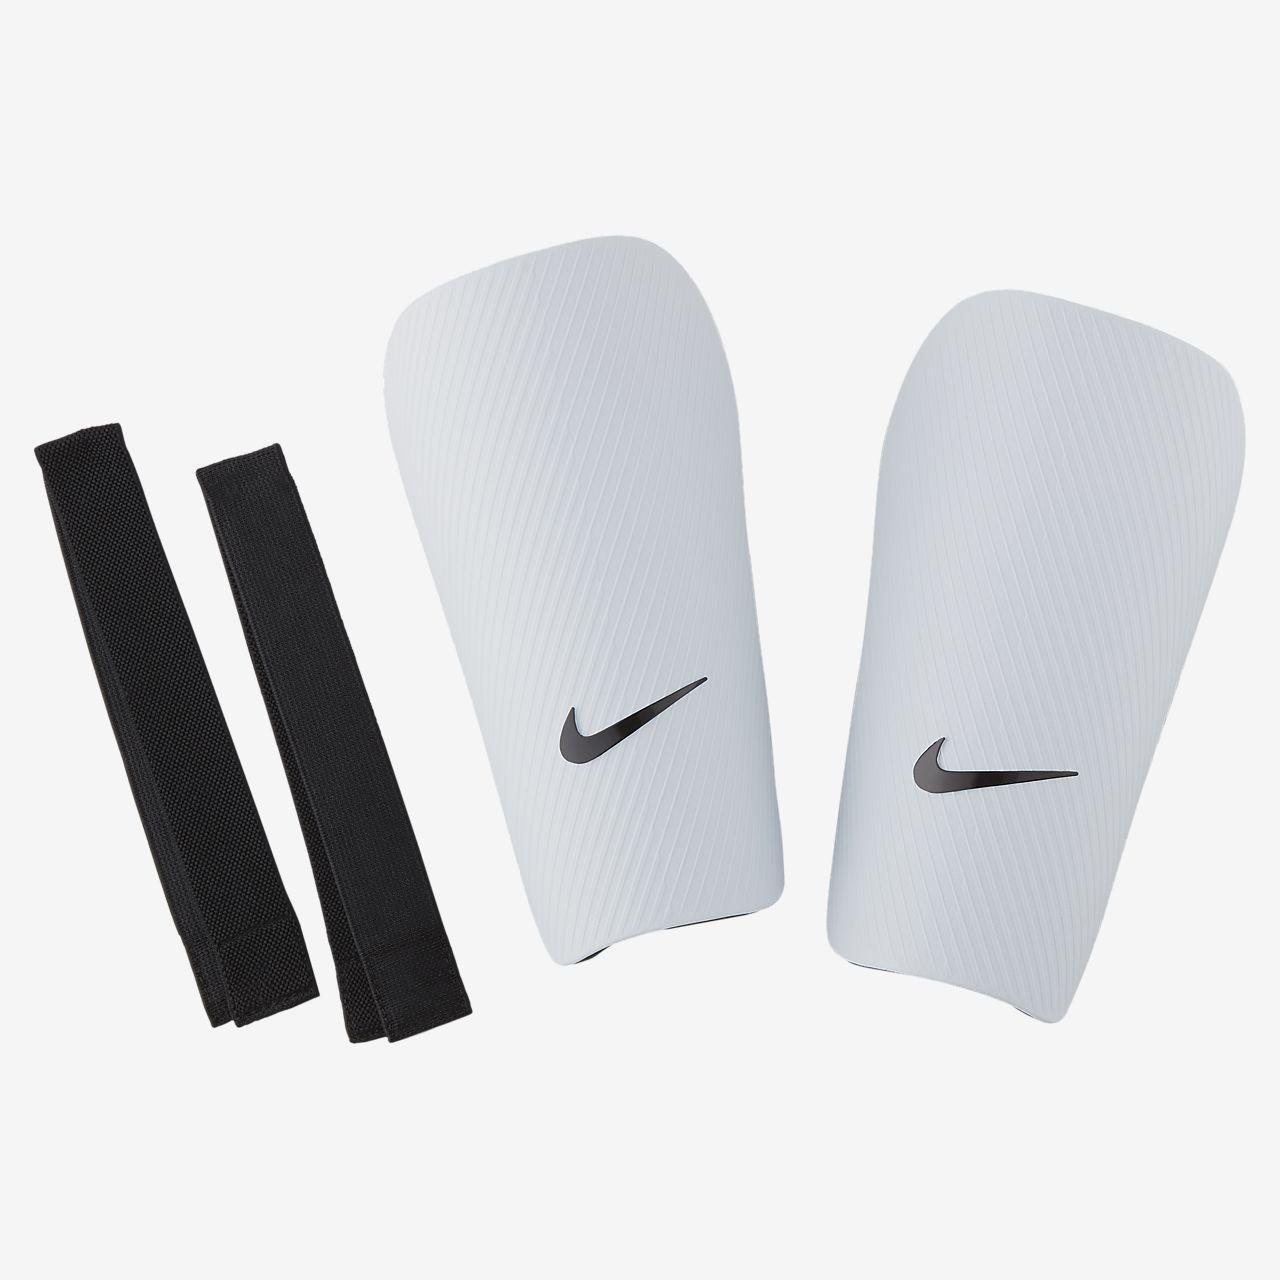 Nagolenniki piłkarskie Nike J CE Soccer